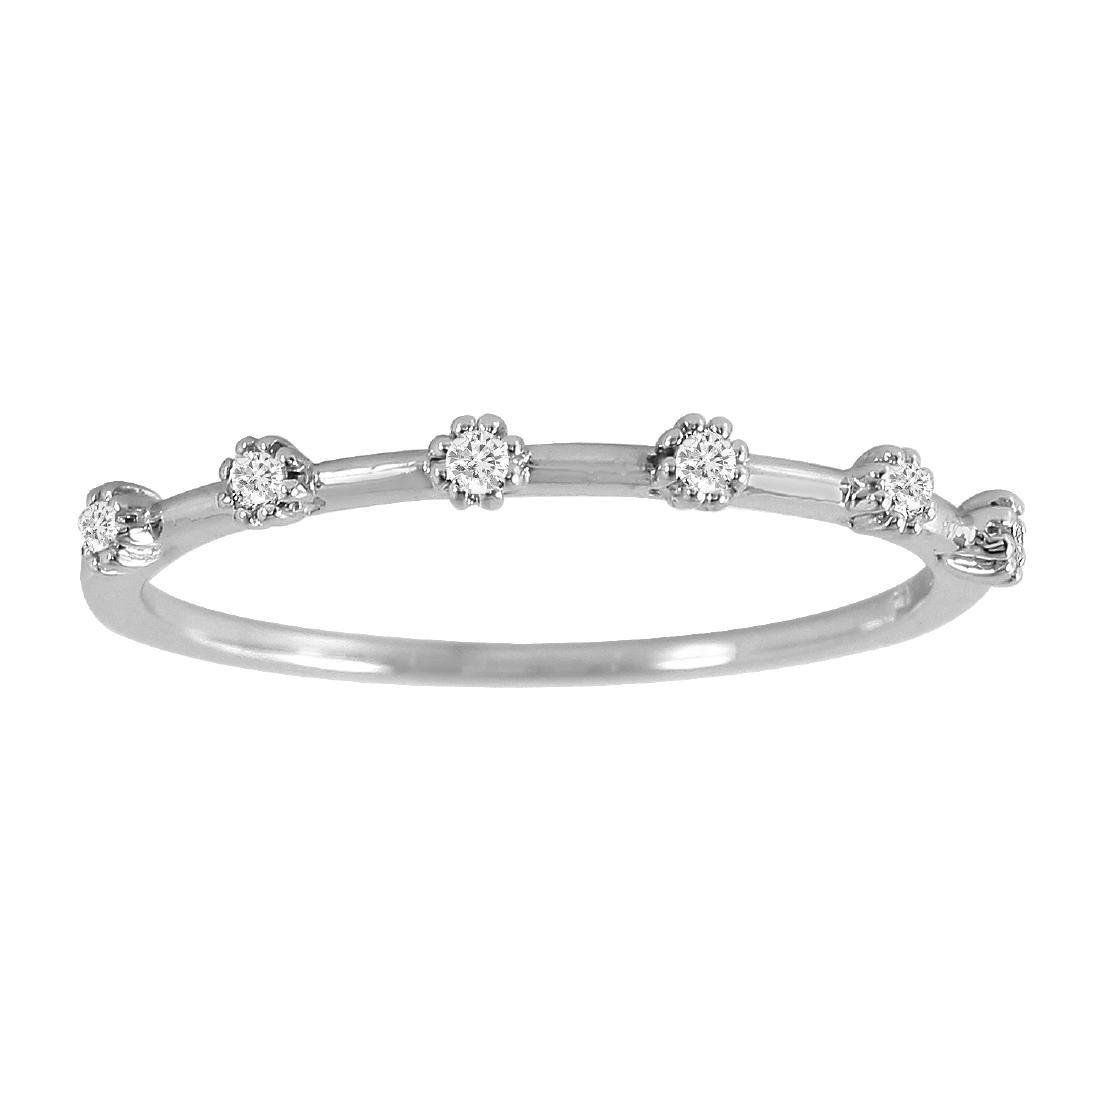 0.09 Carat Natural Diamond 18K Solid White Gold Ring - 2